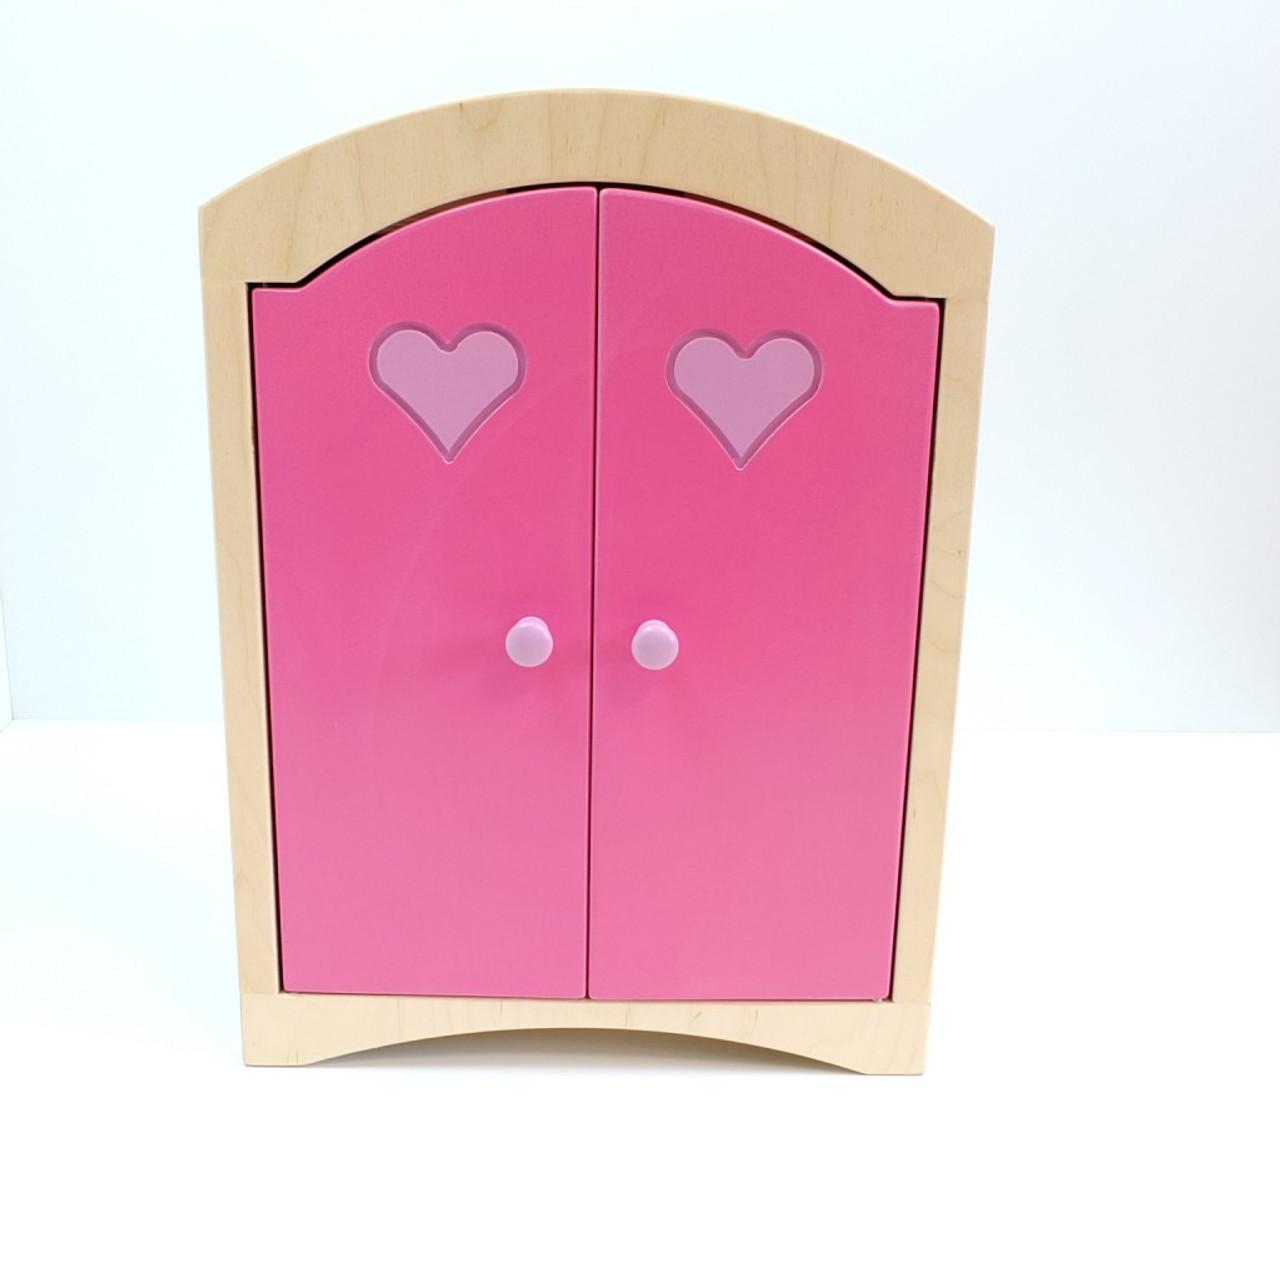 puppenkleiderschrank inkl 5 kleiderb geln material holz farbe natur pink rosa ma e 44. Black Bedroom Furniture Sets. Home Design Ideas